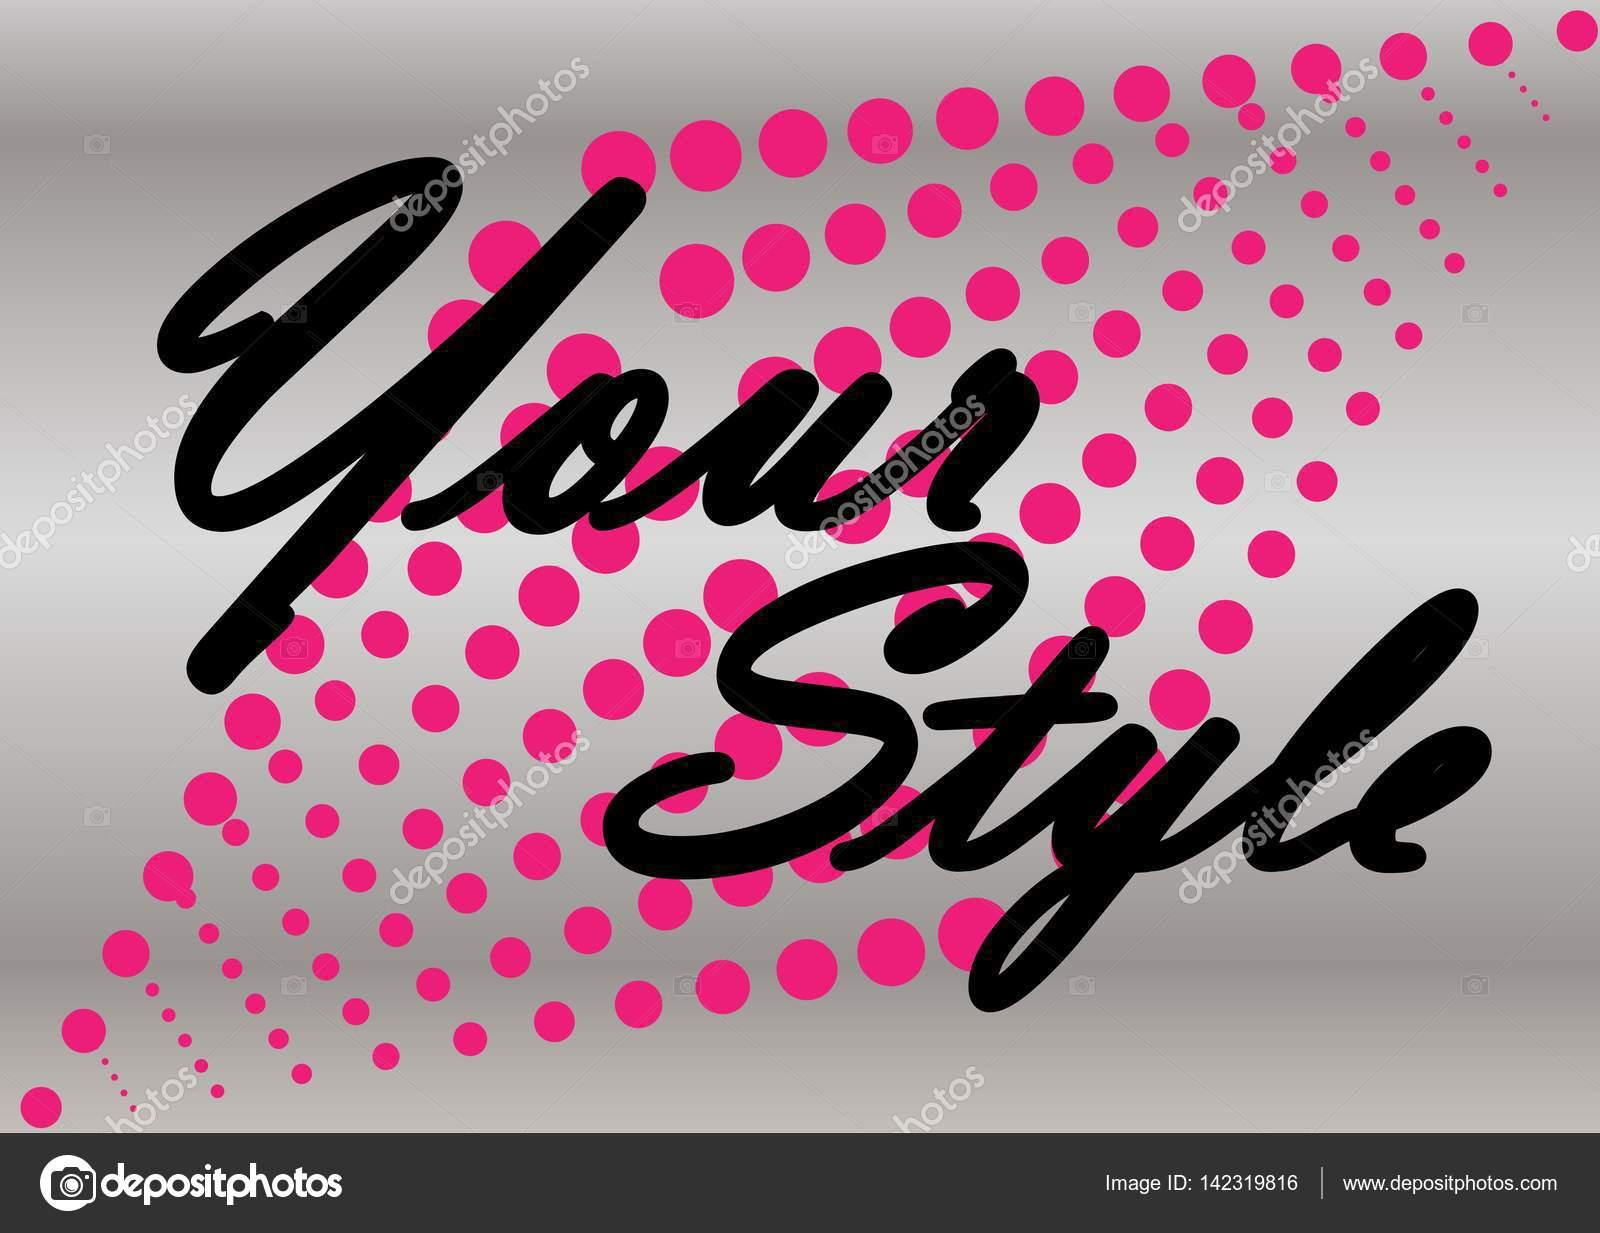 4c1d3a90c Crea tu propio estilo — Vector de stock © ksgldnss  142319816